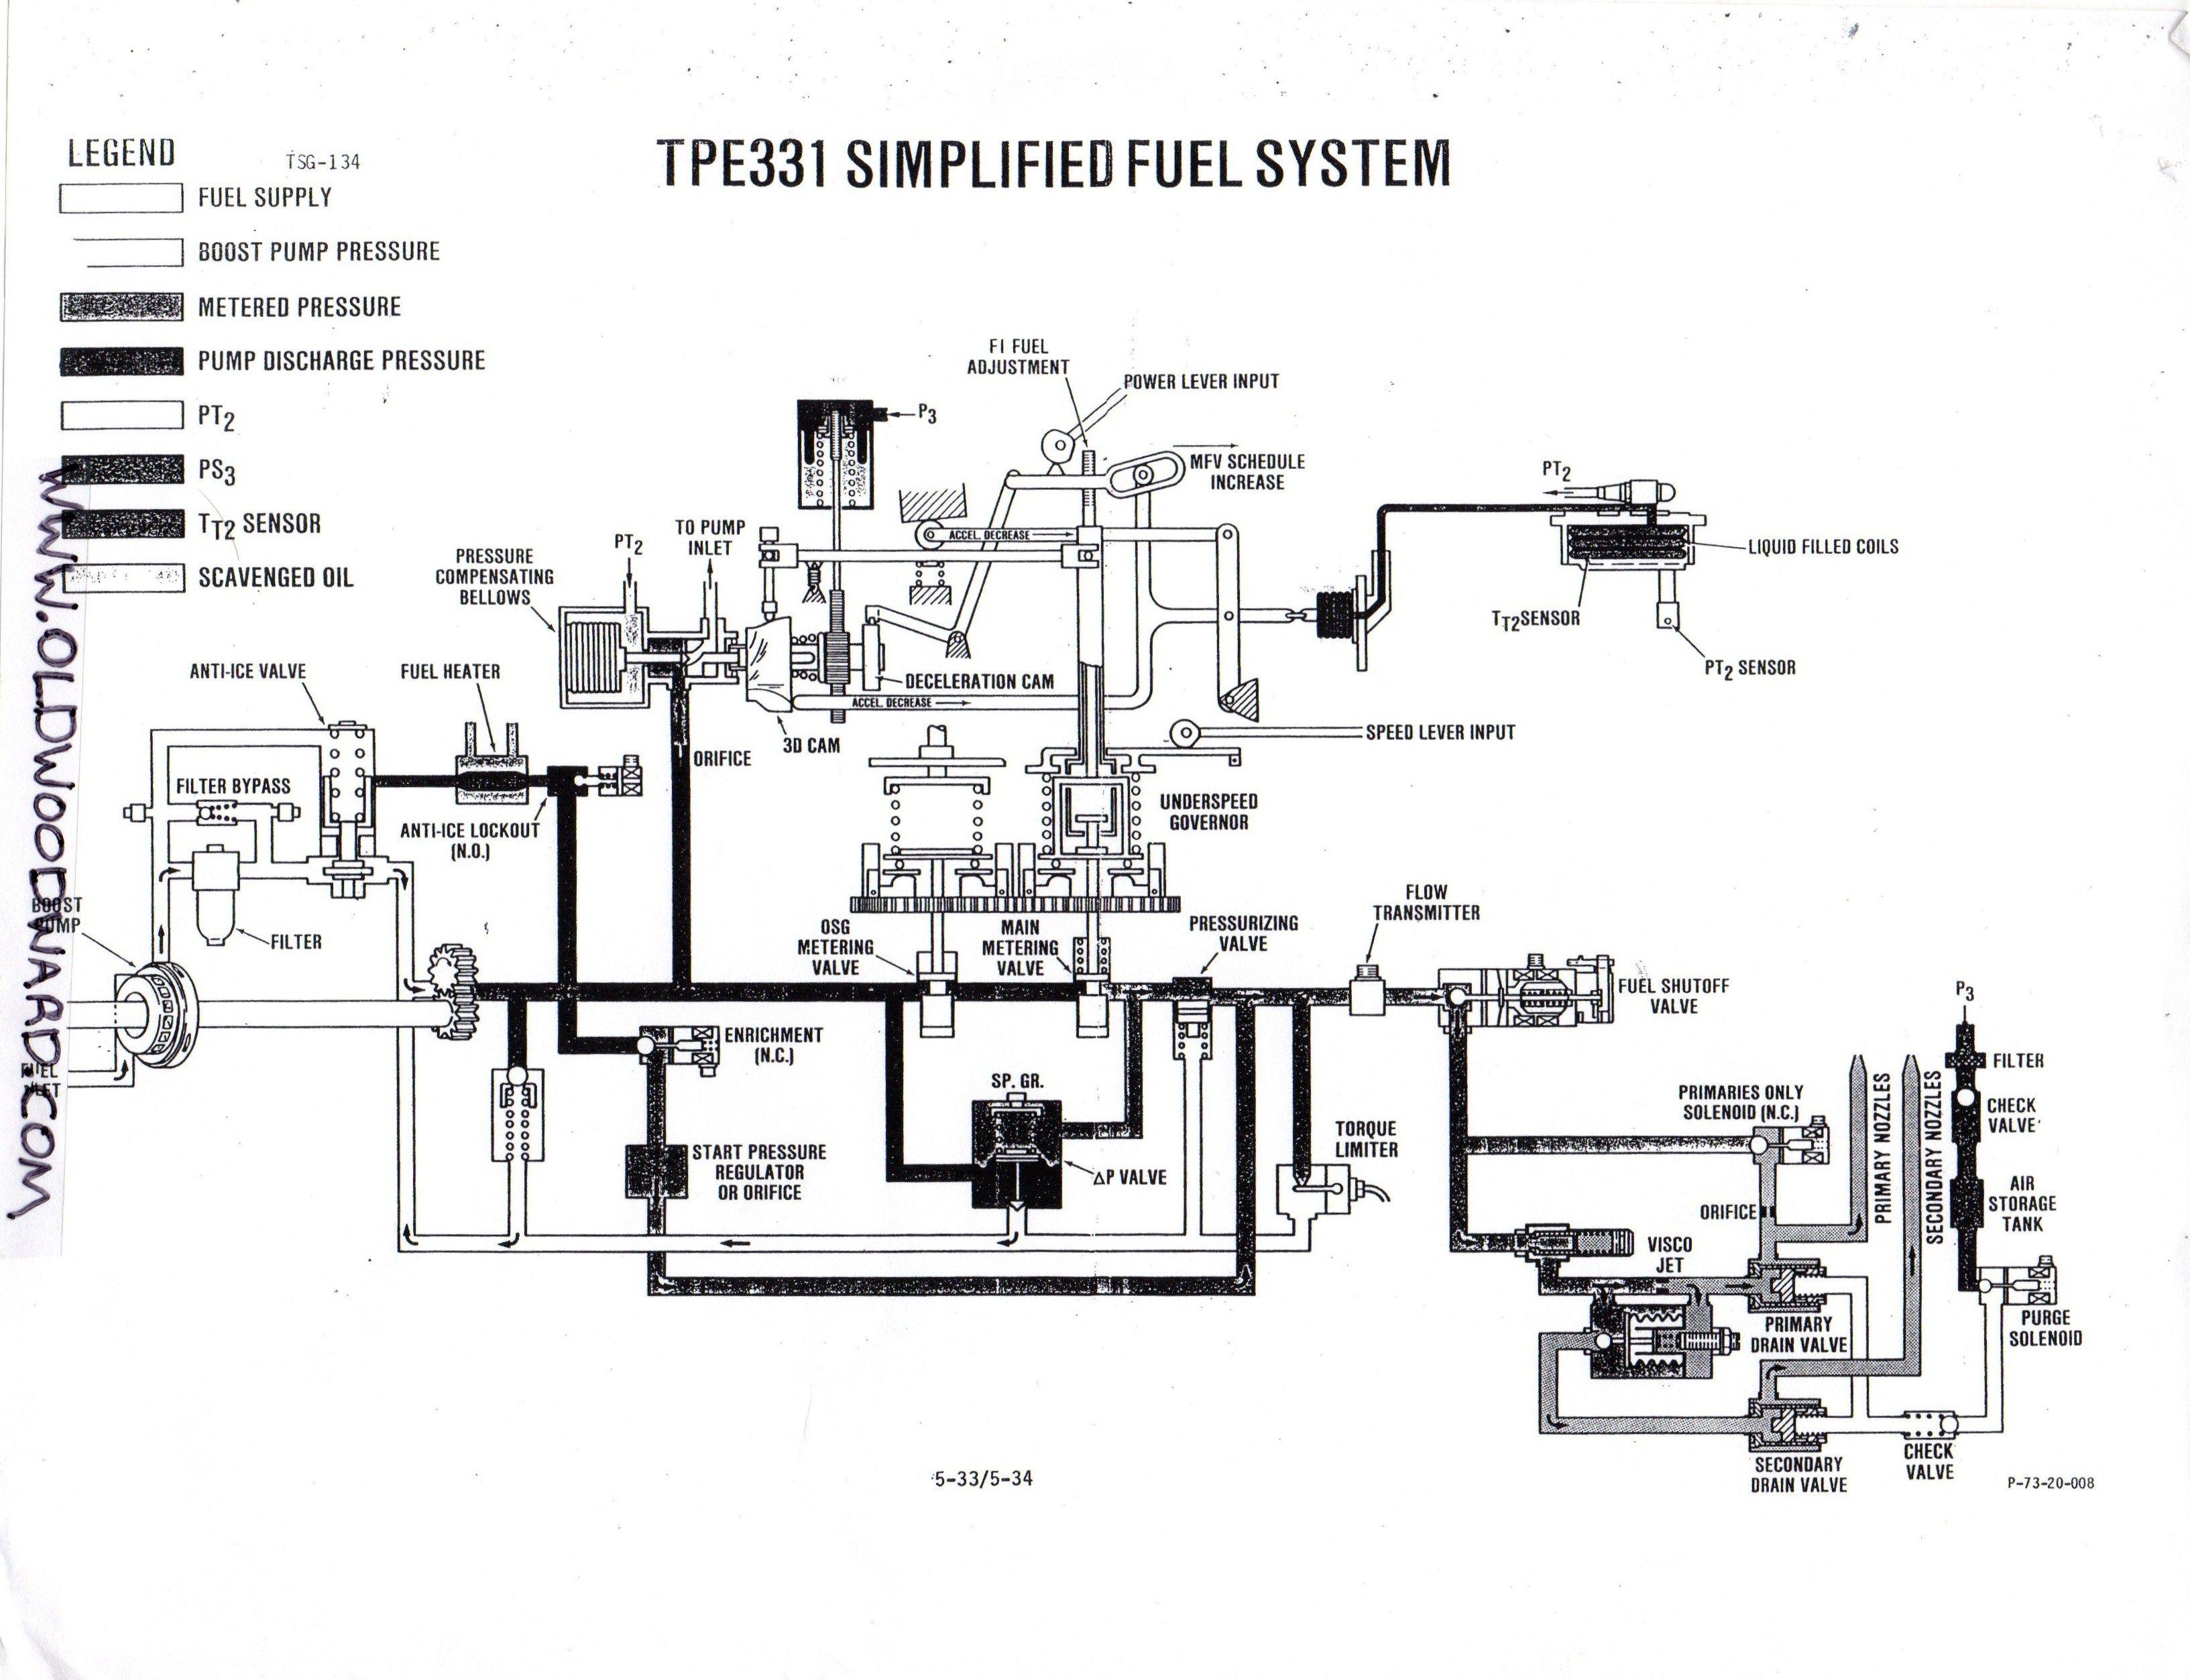 medium resolution of woodward tpe331 gas turbine main engine control training manual